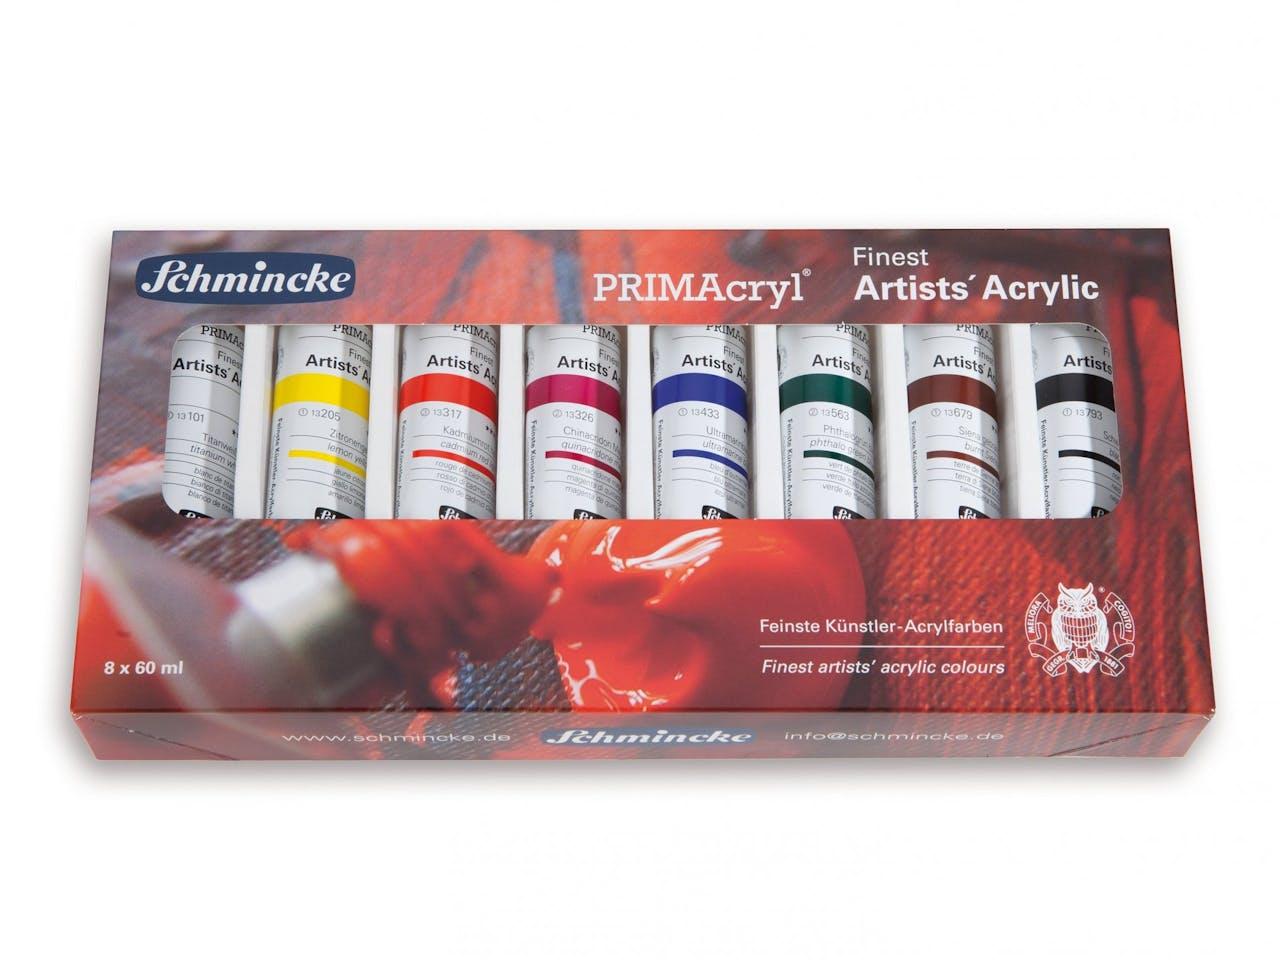 Schmincke Acrylfarbe Primacryl Set, 8er-Set in Karton, Metalltuben 60 ml (73002)